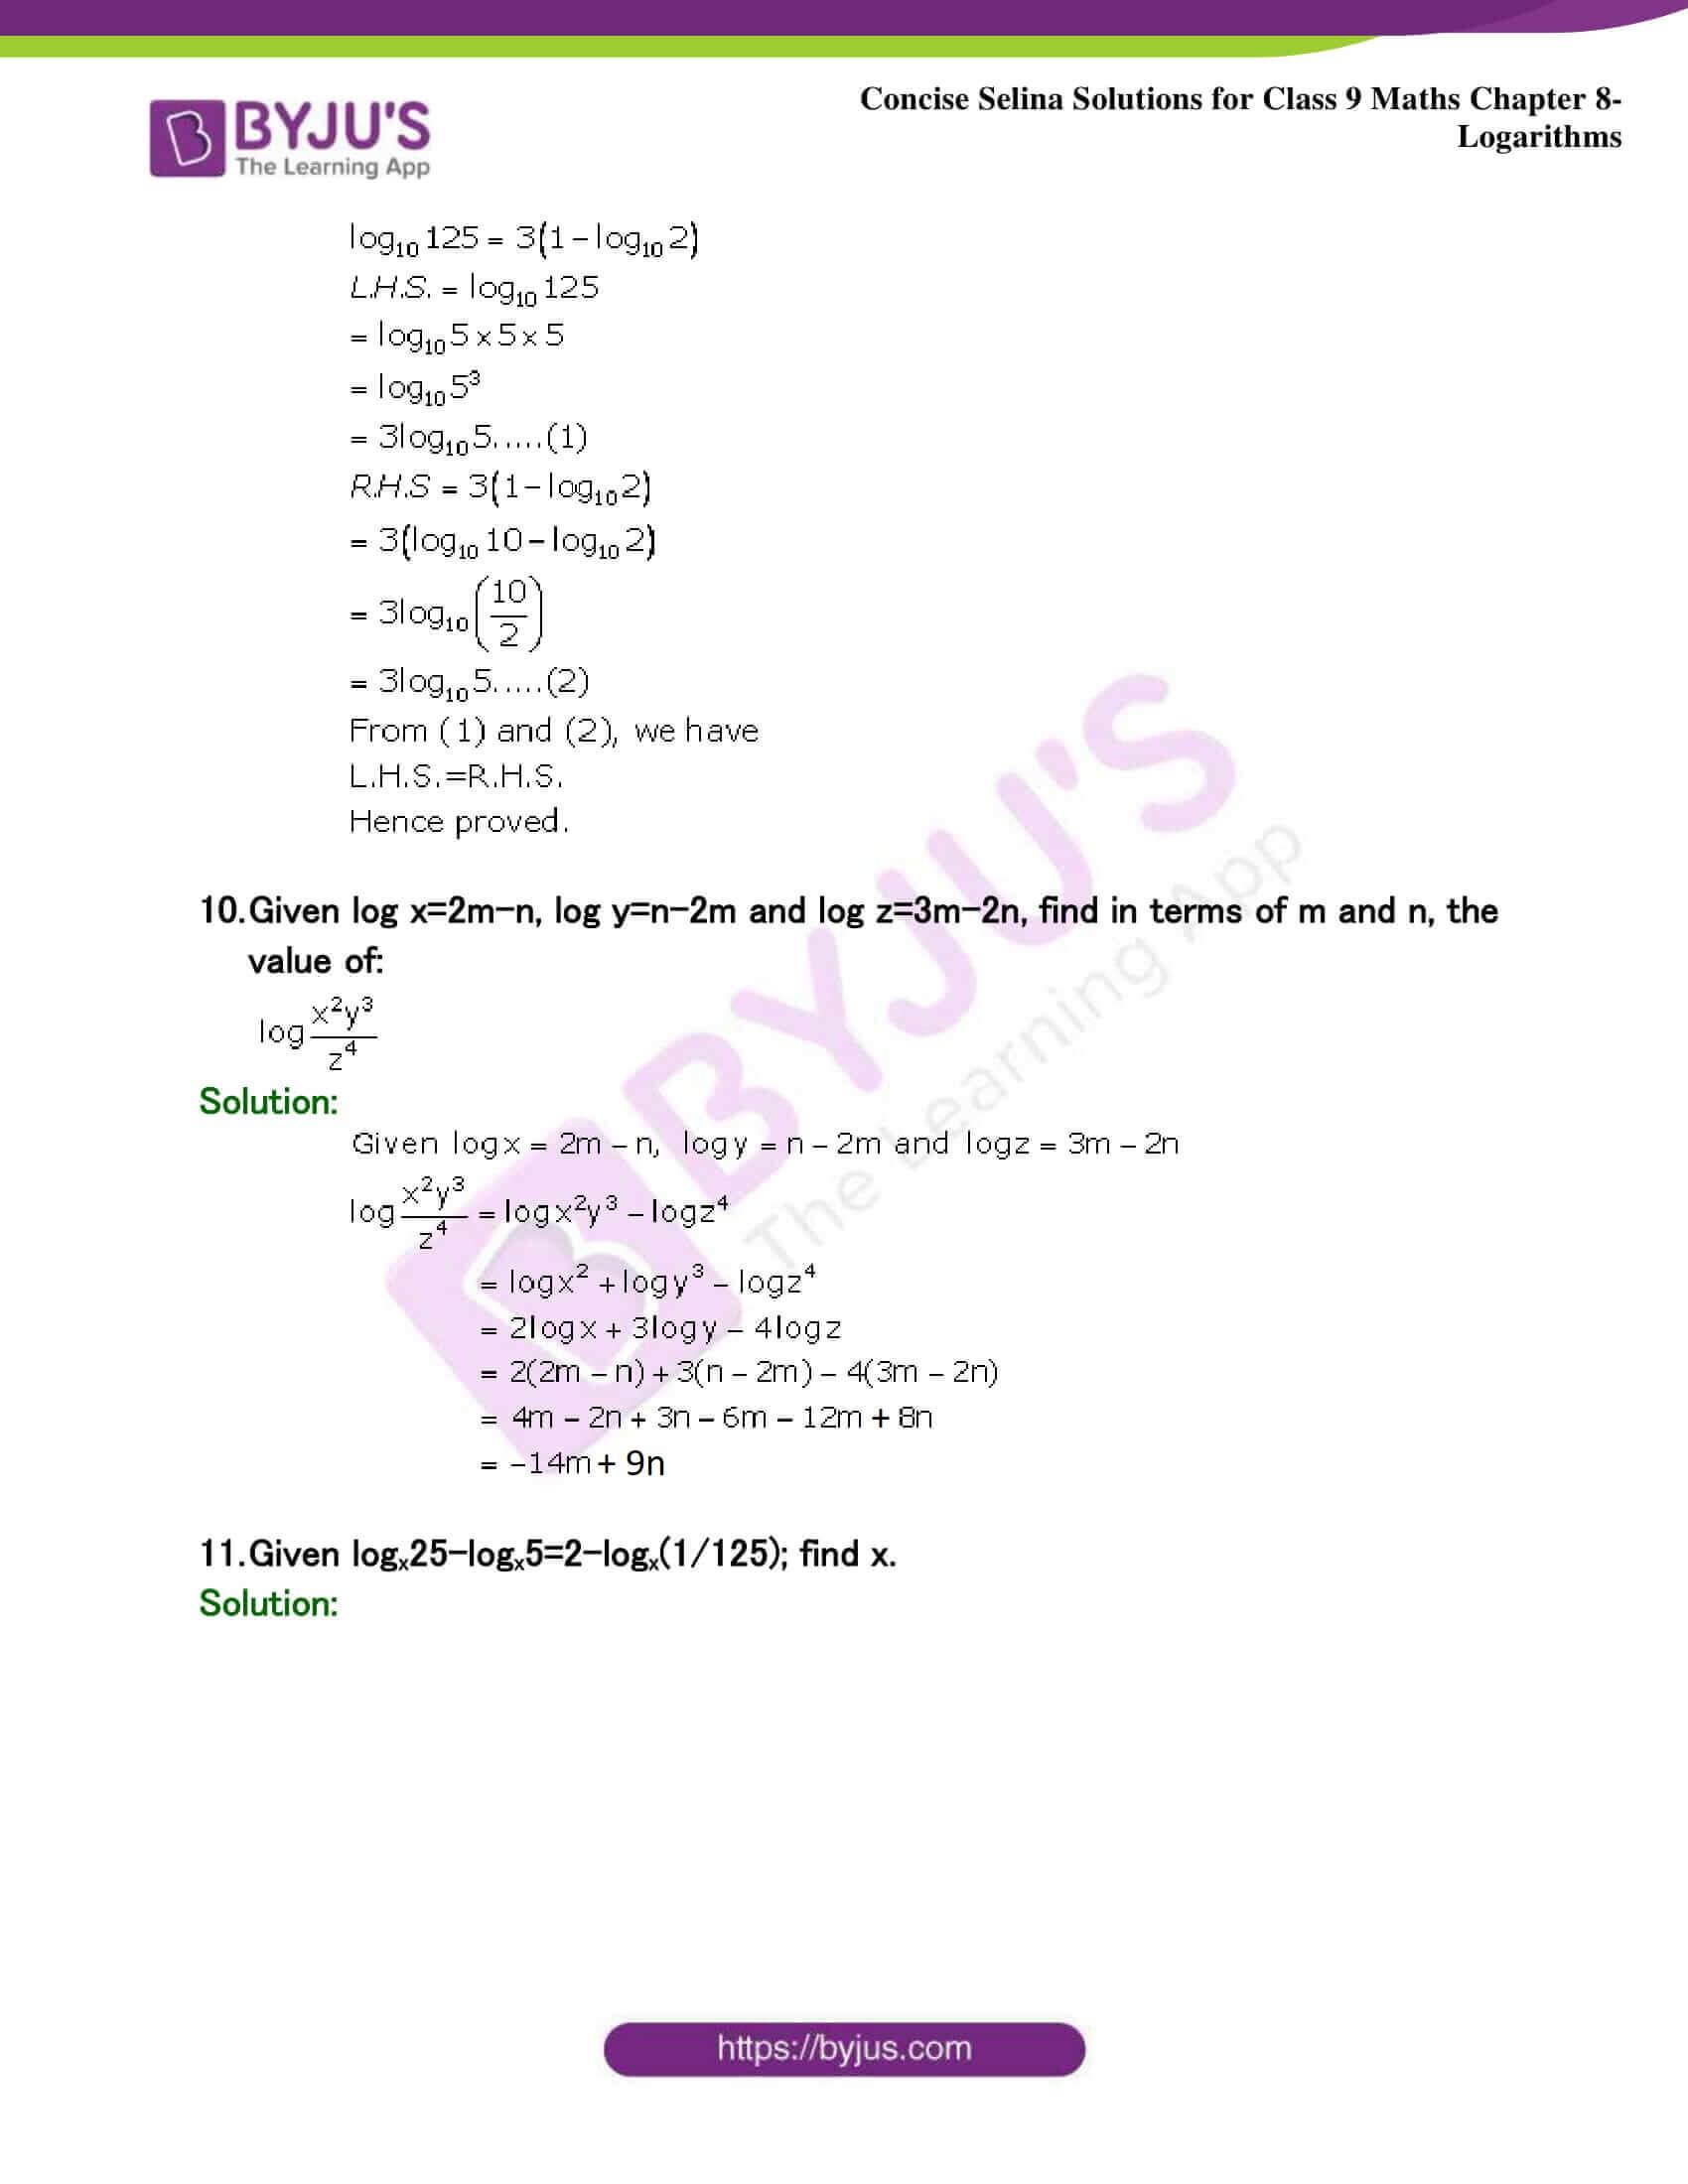 Selina Solutions Class 9 Maths Chapter 8 Logarithms part 36